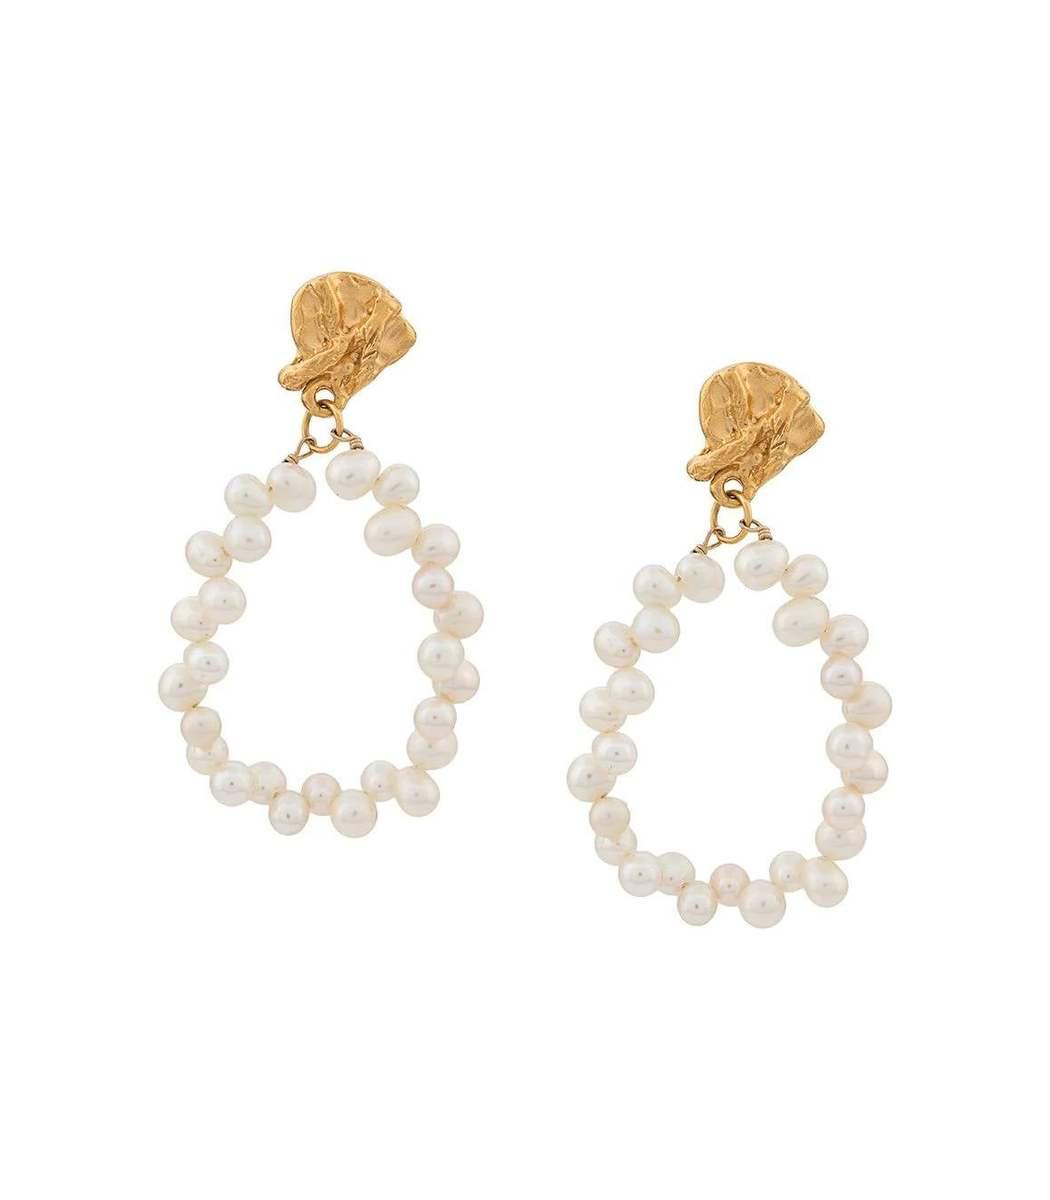 Alighieri Accessories Apollo`s Story earrings